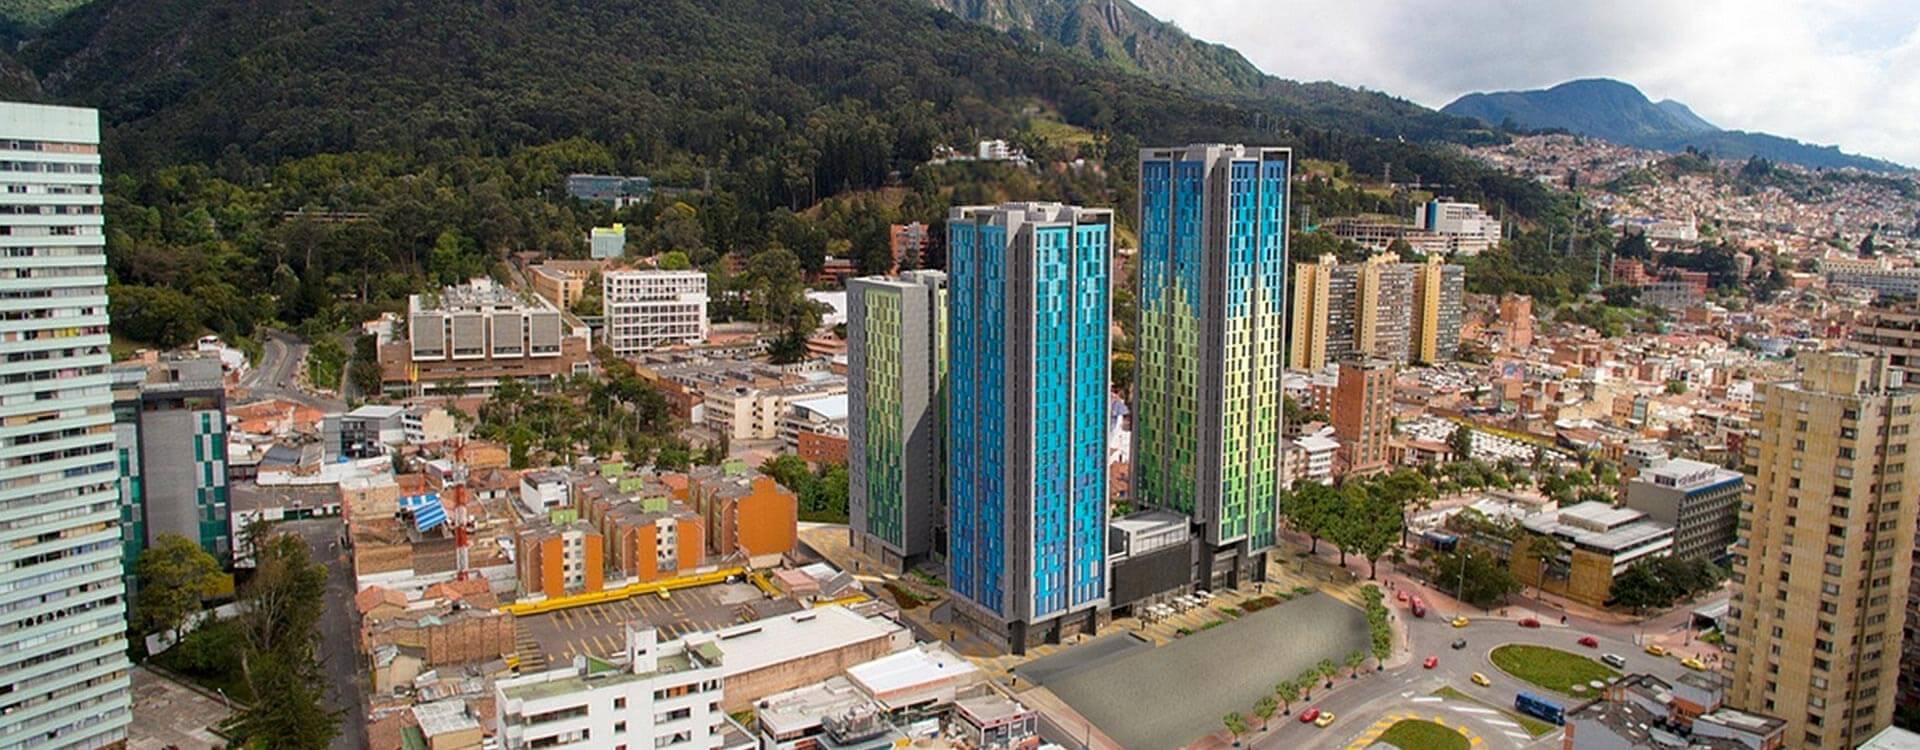 Vista aérea de la Torre Séneca, vivienda universitaria